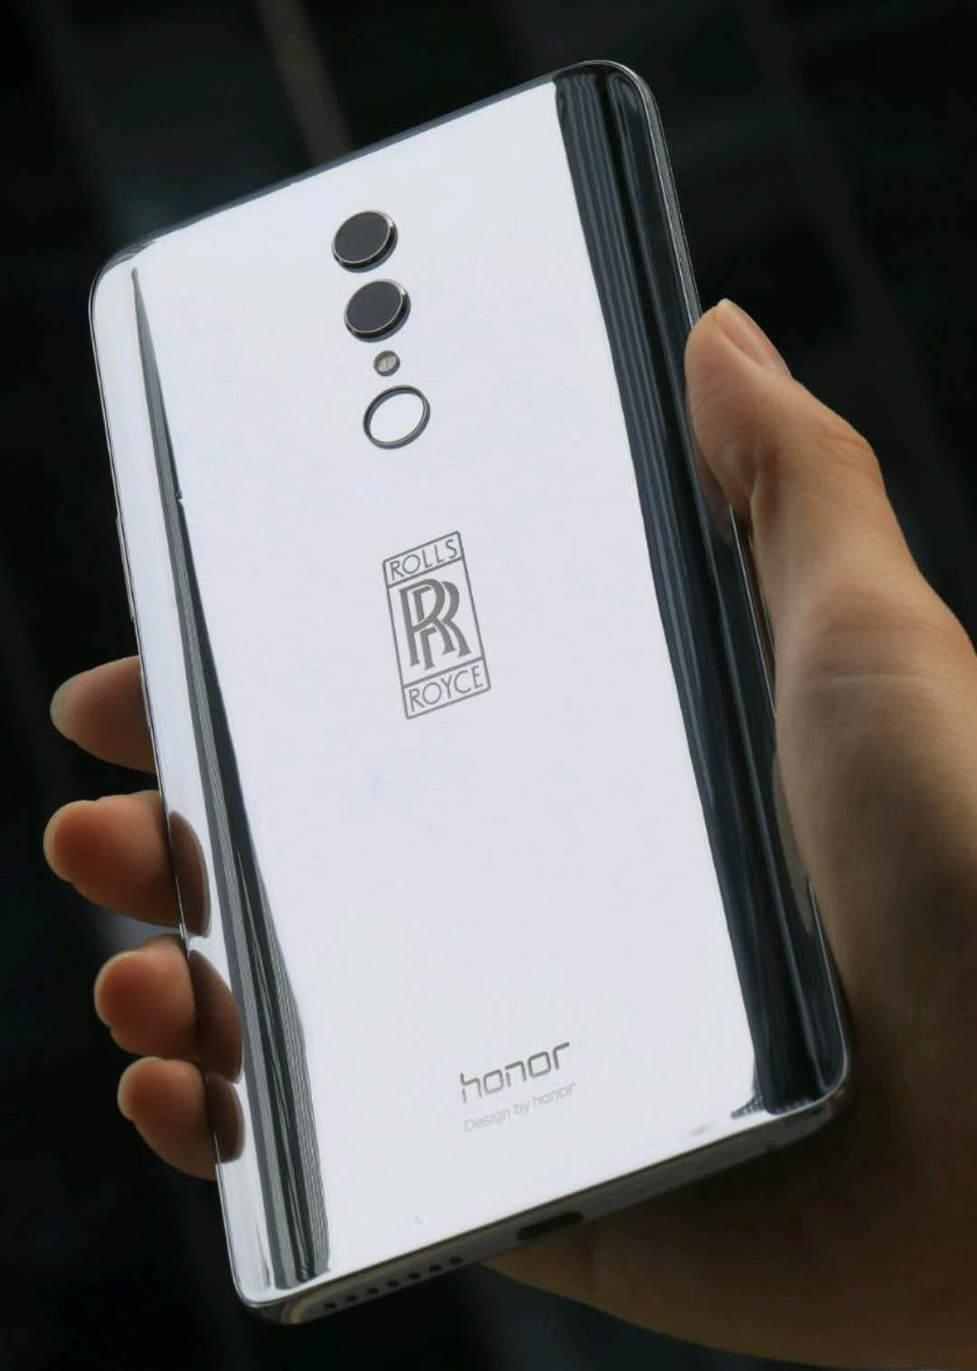 Honor Note 10 Rolls Royce